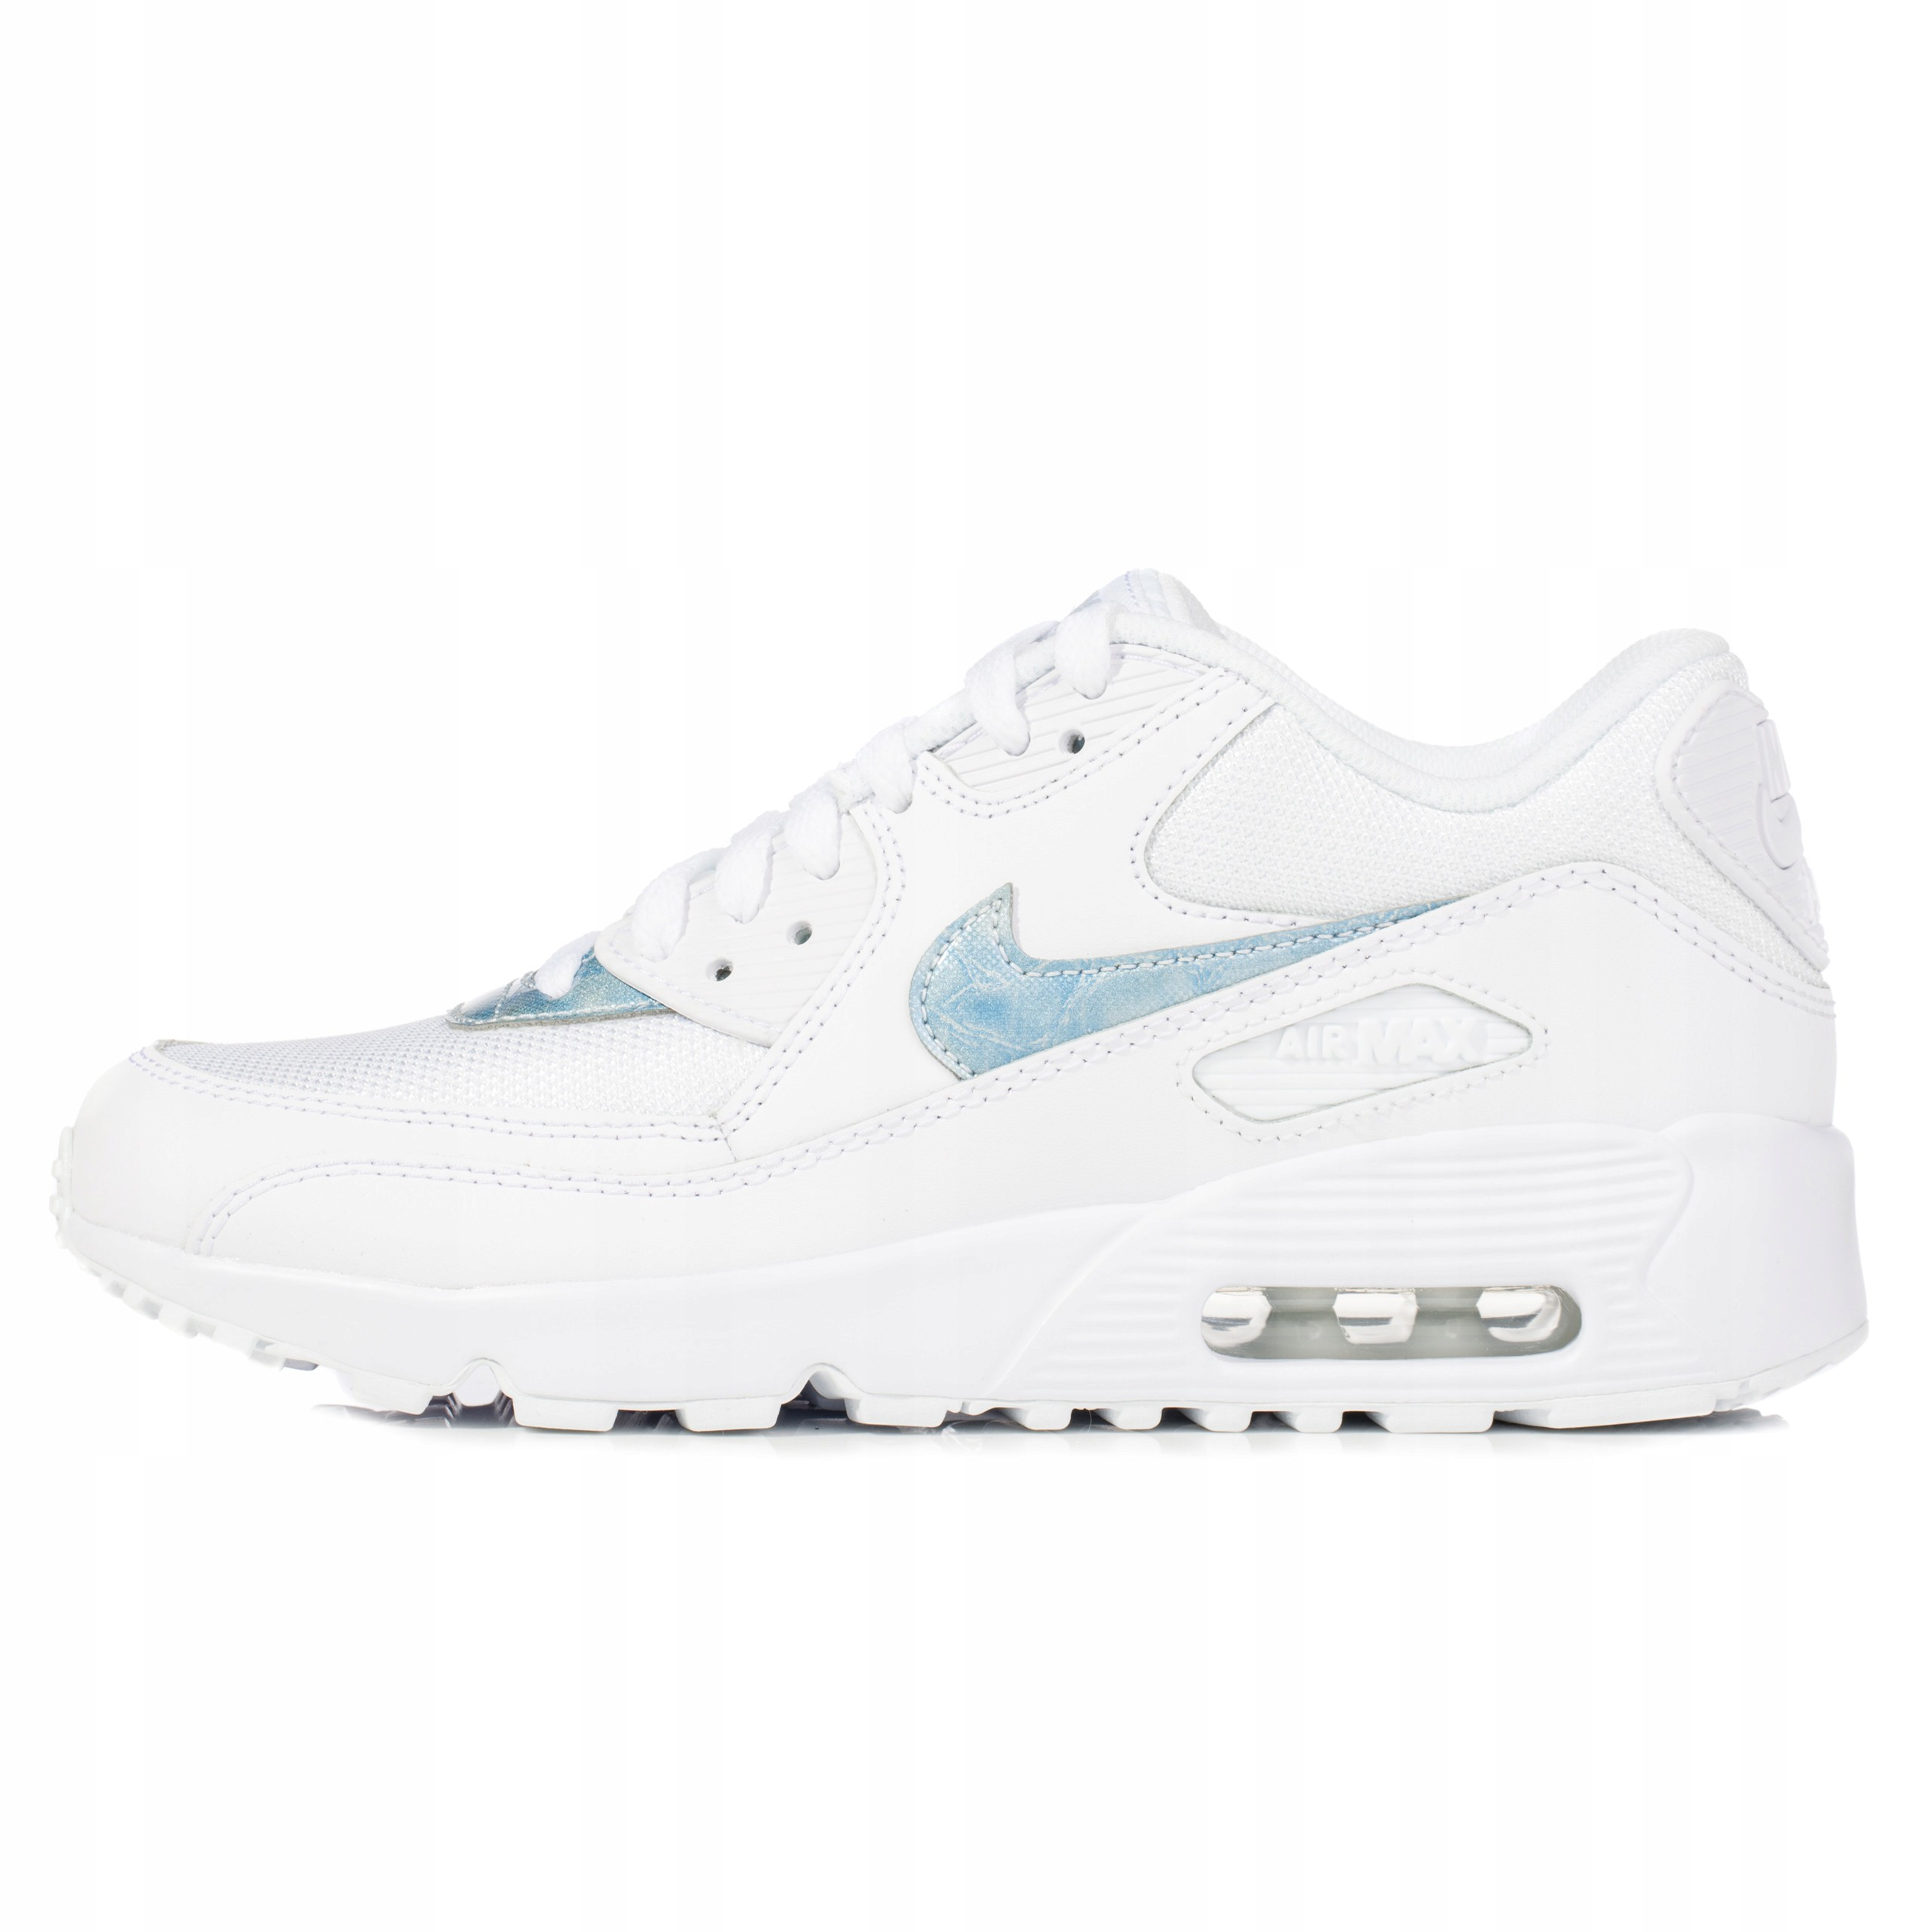 Buty damskie Nike Air Max 90 białe 833418 111 7369771628